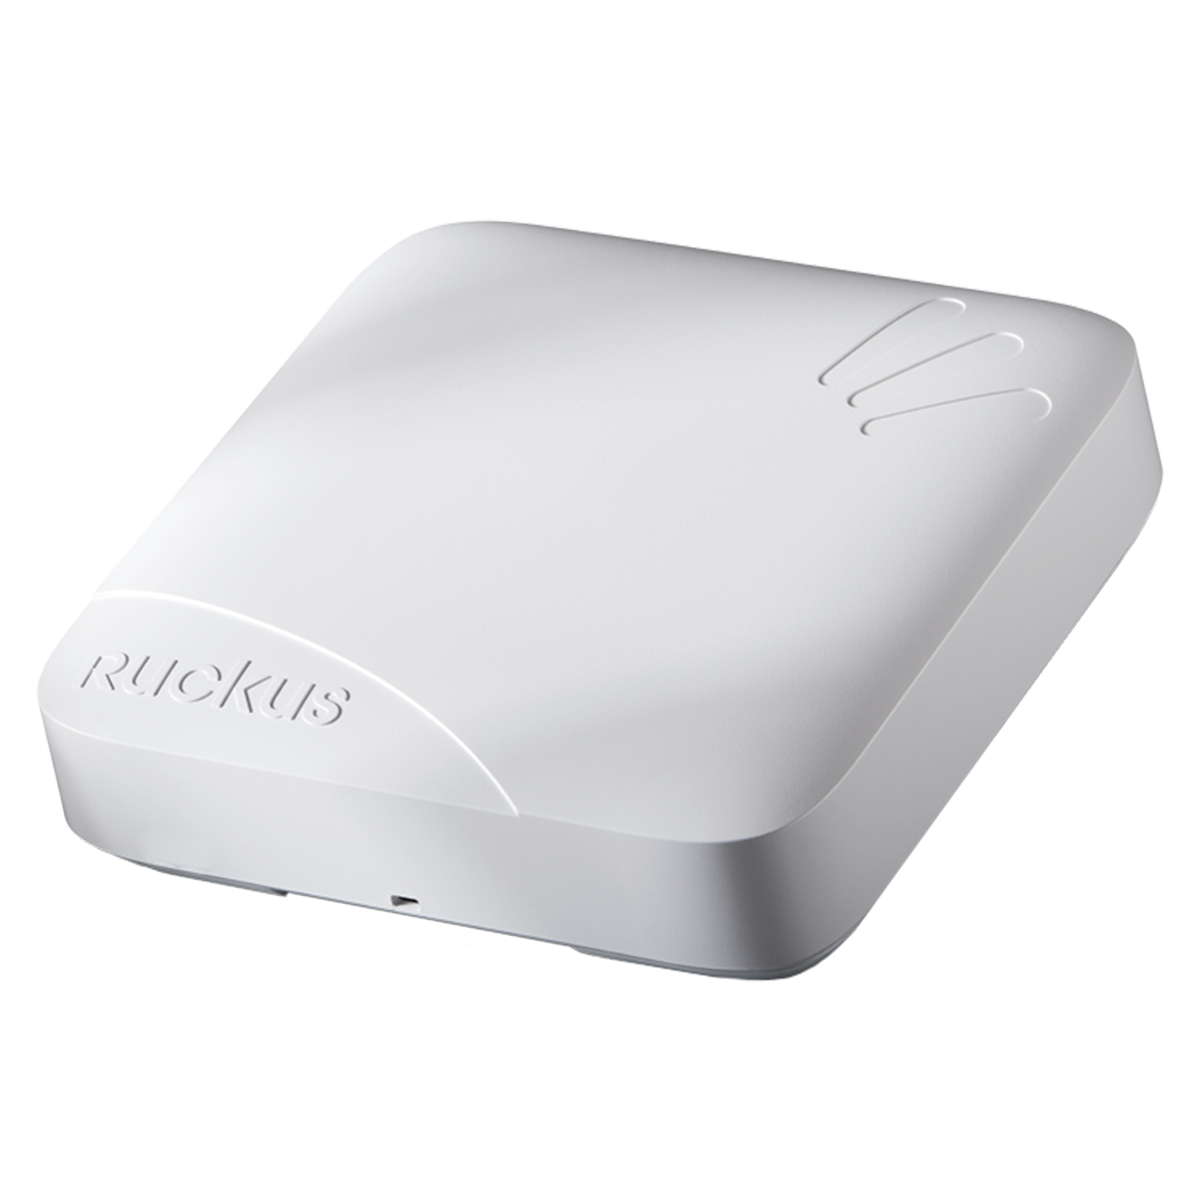 Ruckus ZoneFlex R700 Smart Wi-Fi Access Point